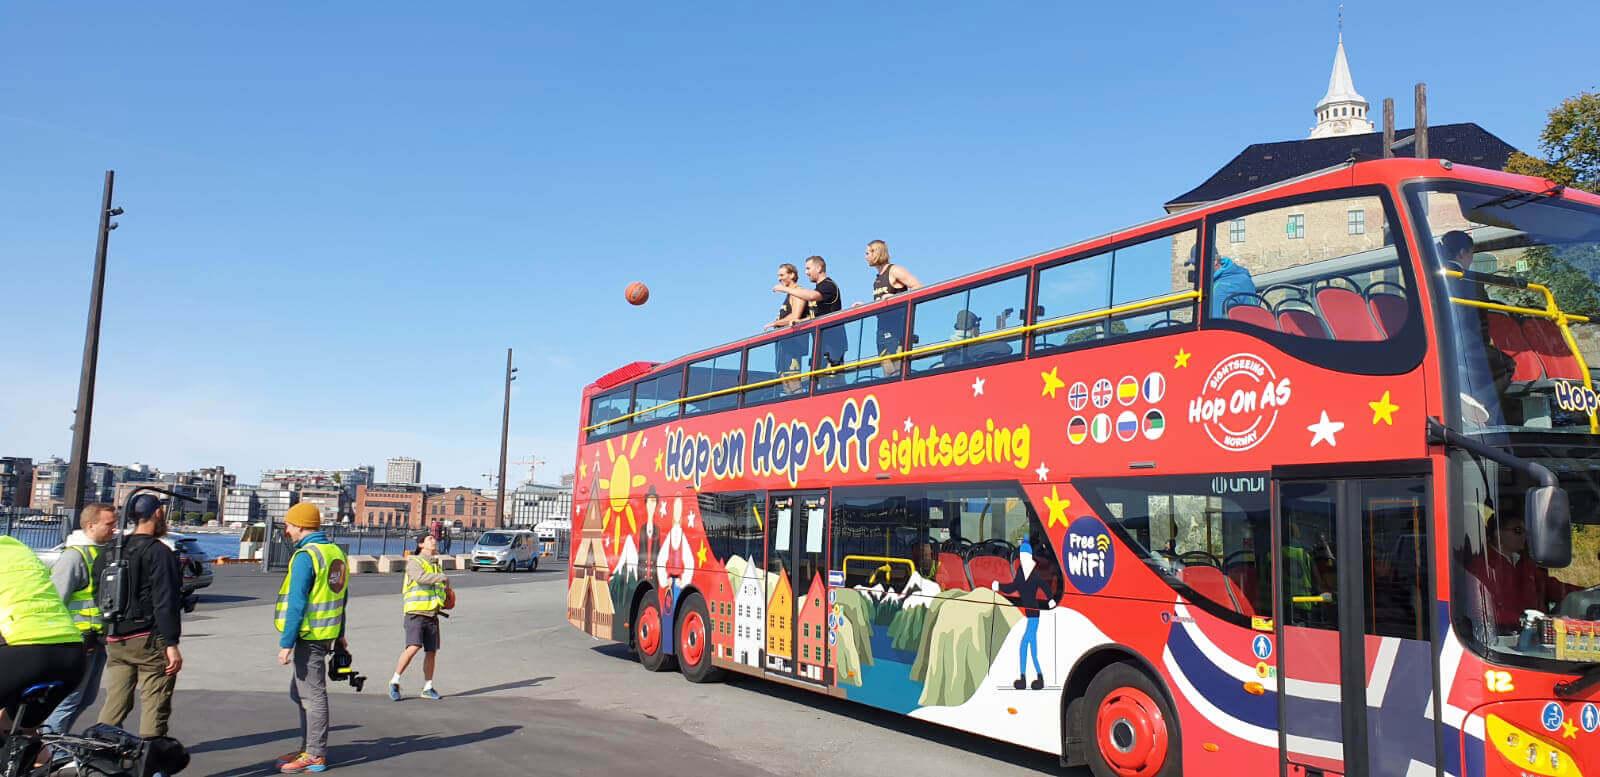 Hop On Hop Off bus in Alle mot 1 recording for NRK